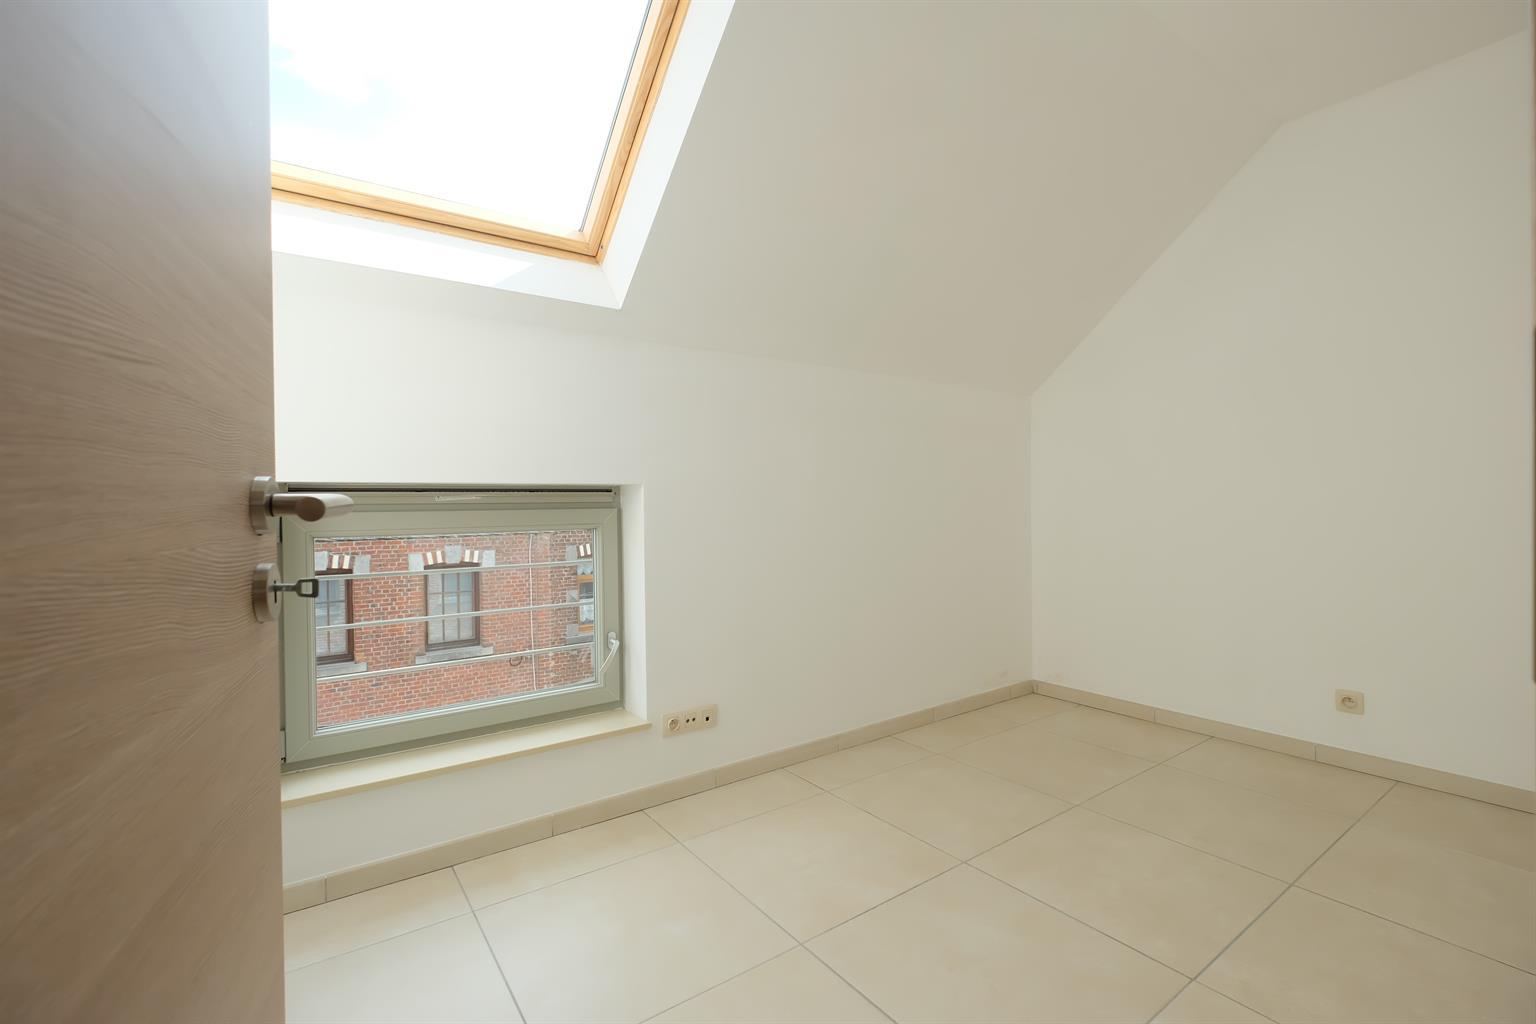 Appartement - Soignies - #4223150-5